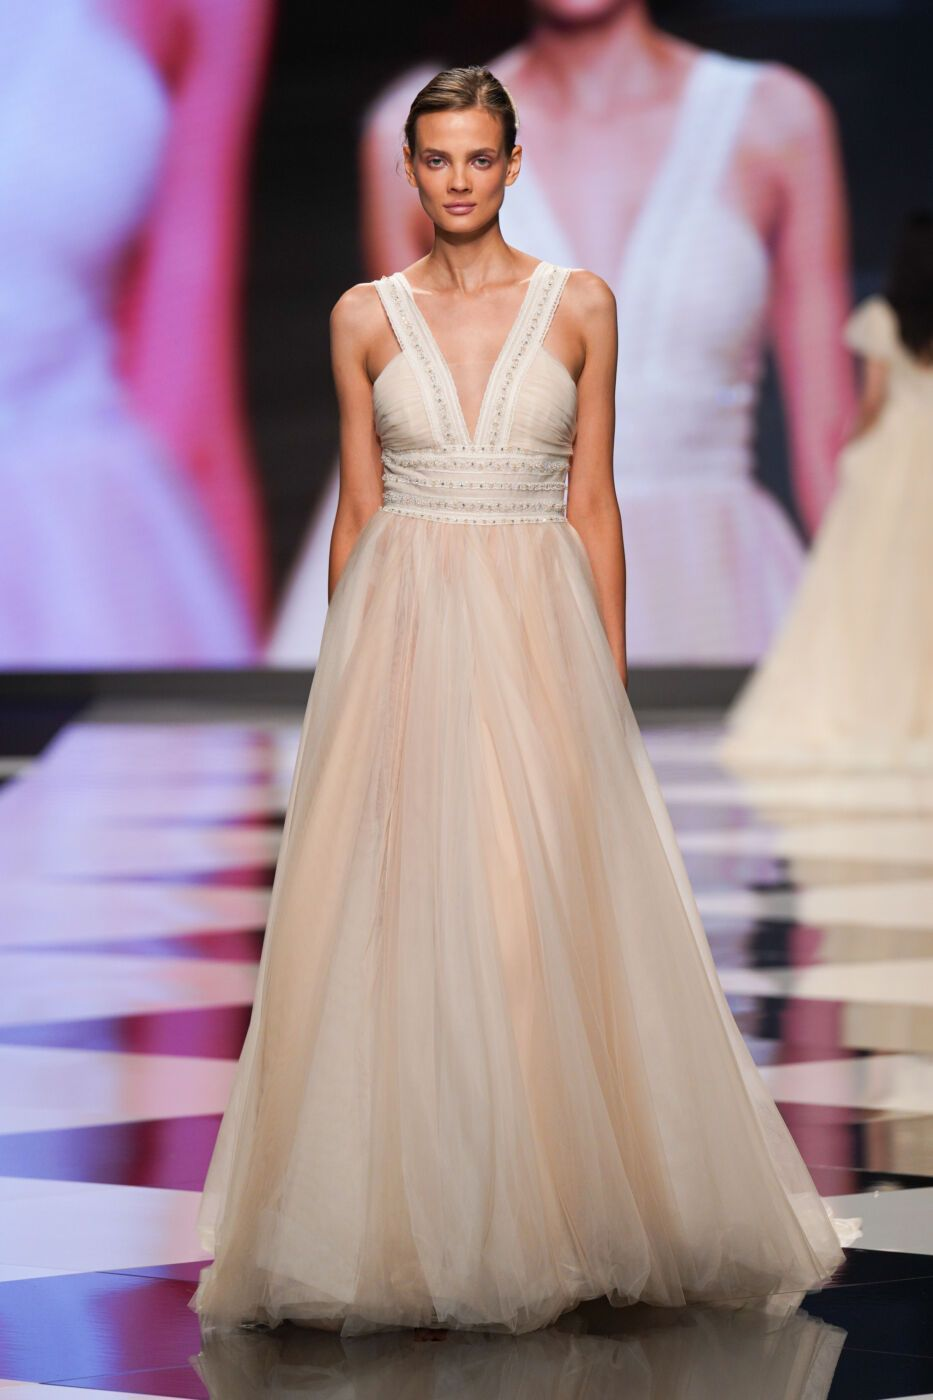 https://www.weddingmagazine.com.ua/wp-content/uploads/2021/08/bellanuono-blumarine-2.jpg